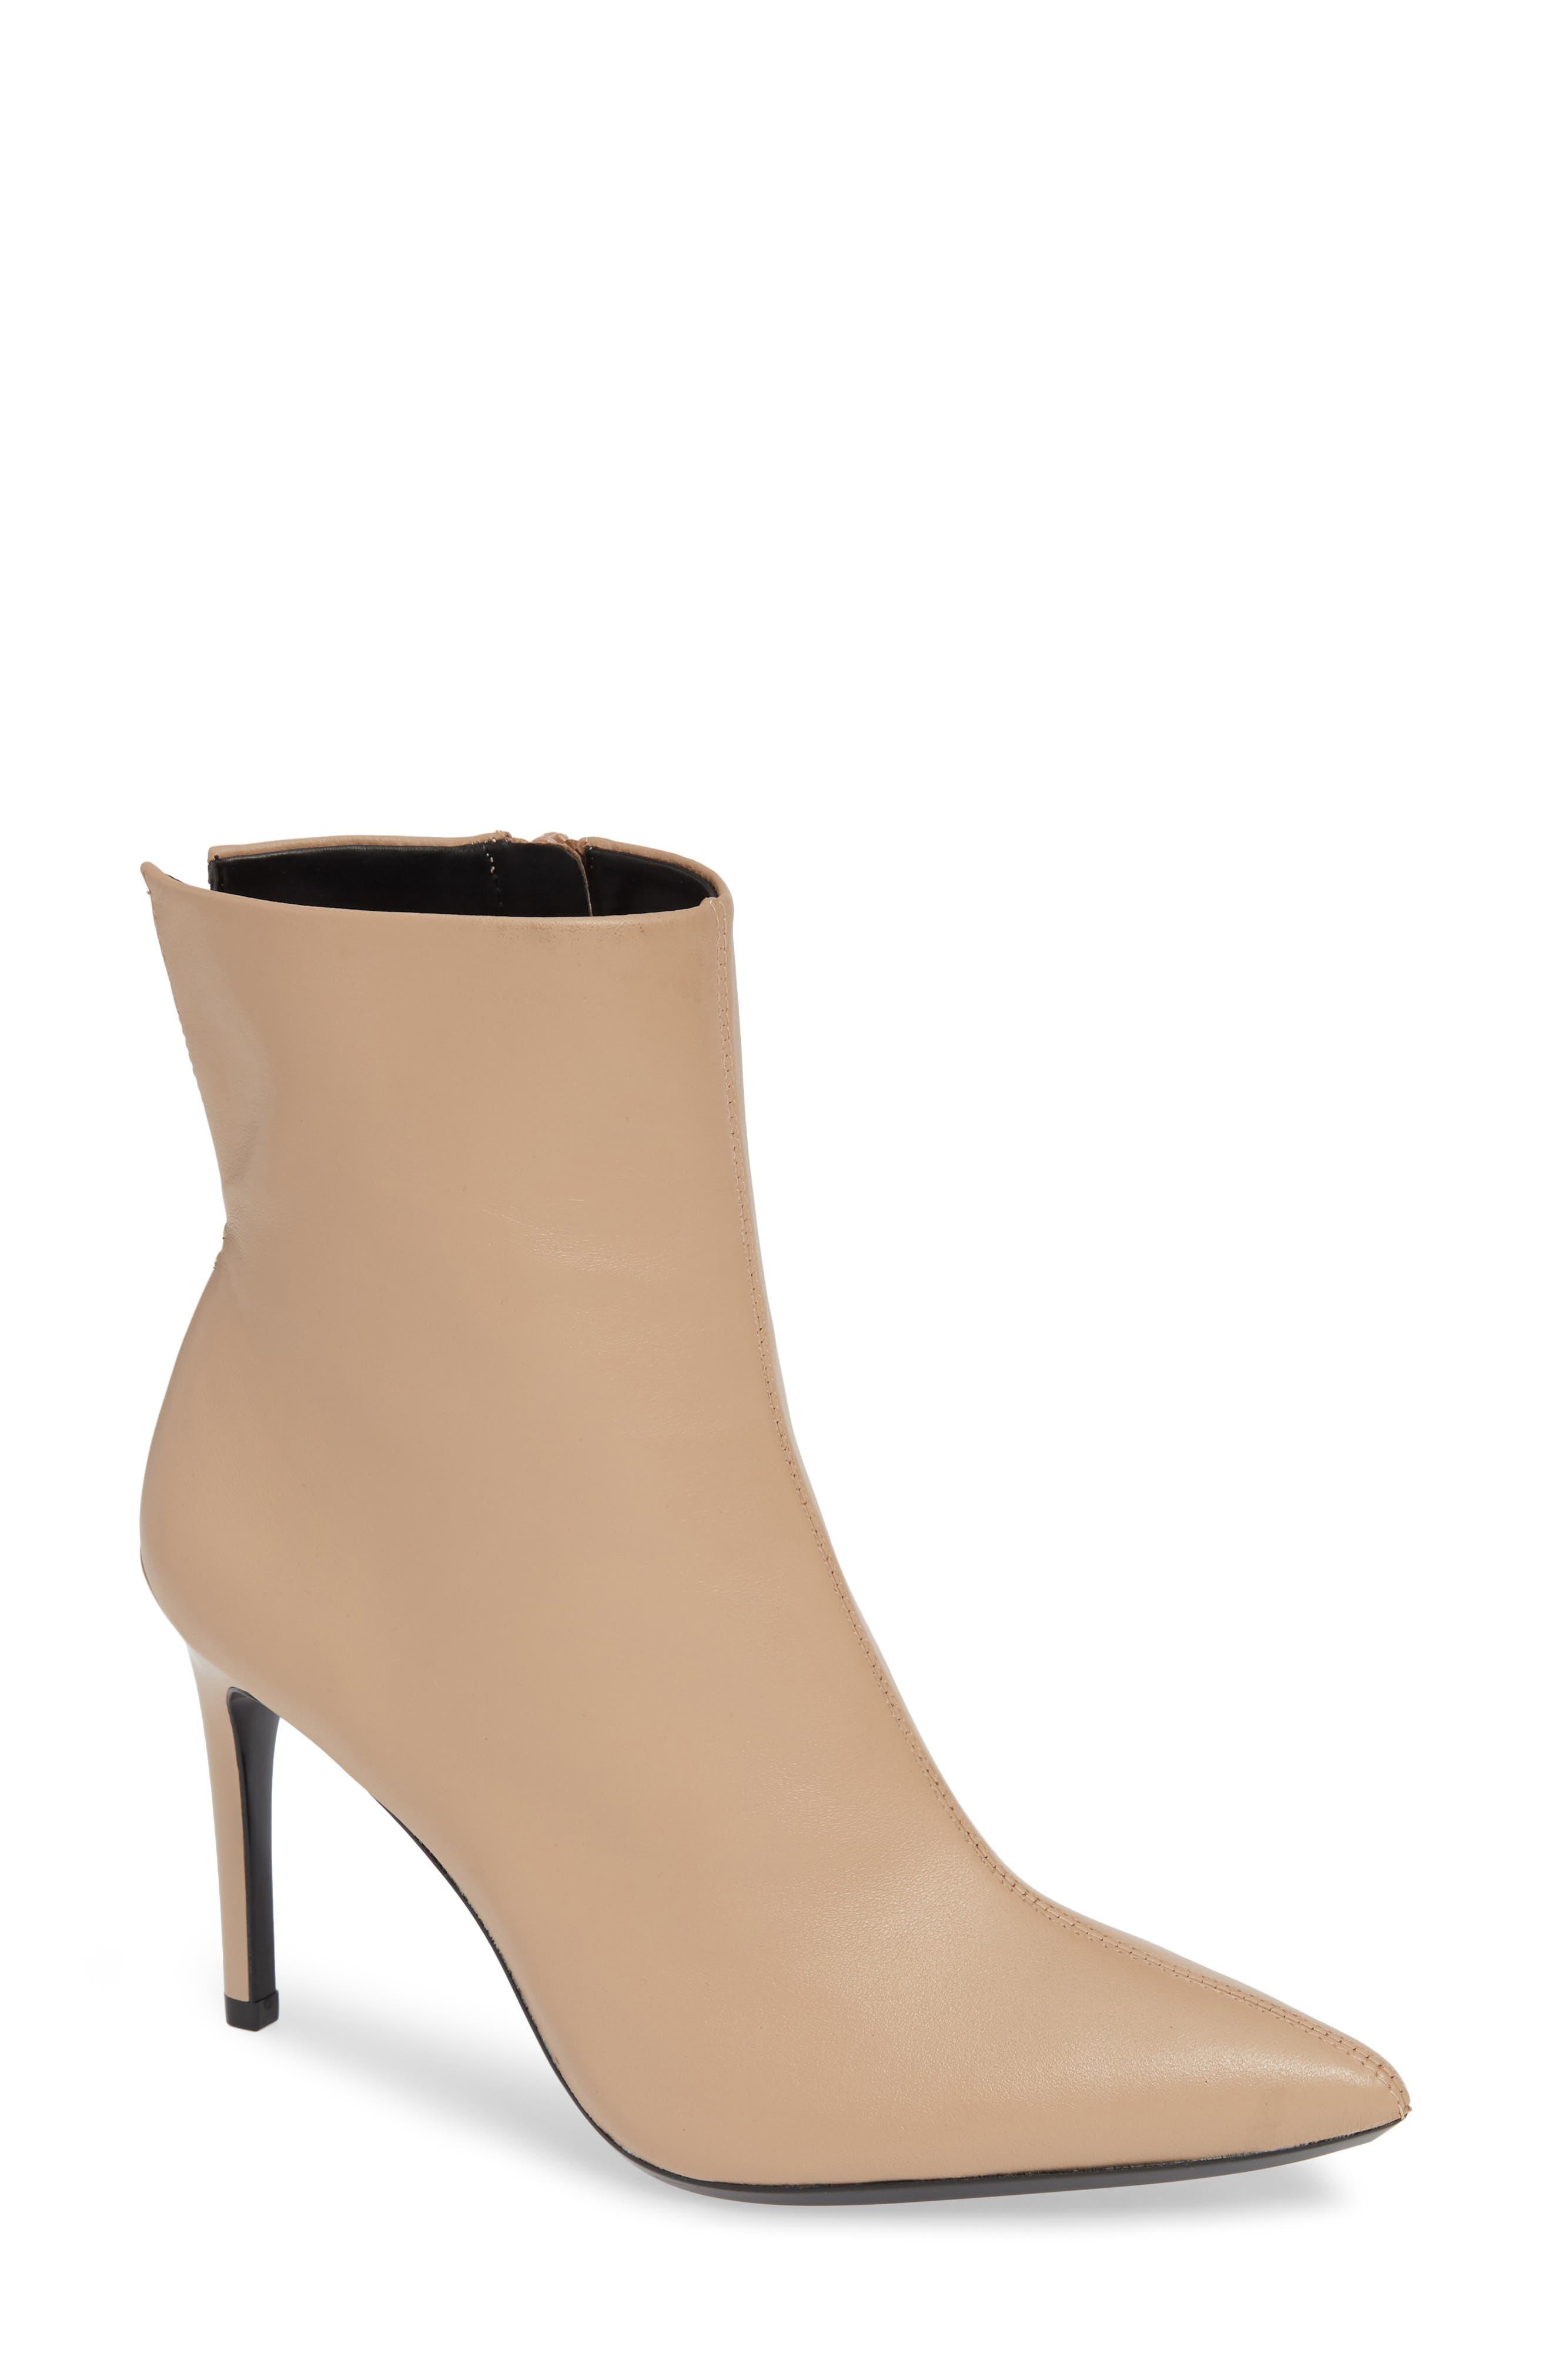 Calvin Klein Revel Stiletto Bootie